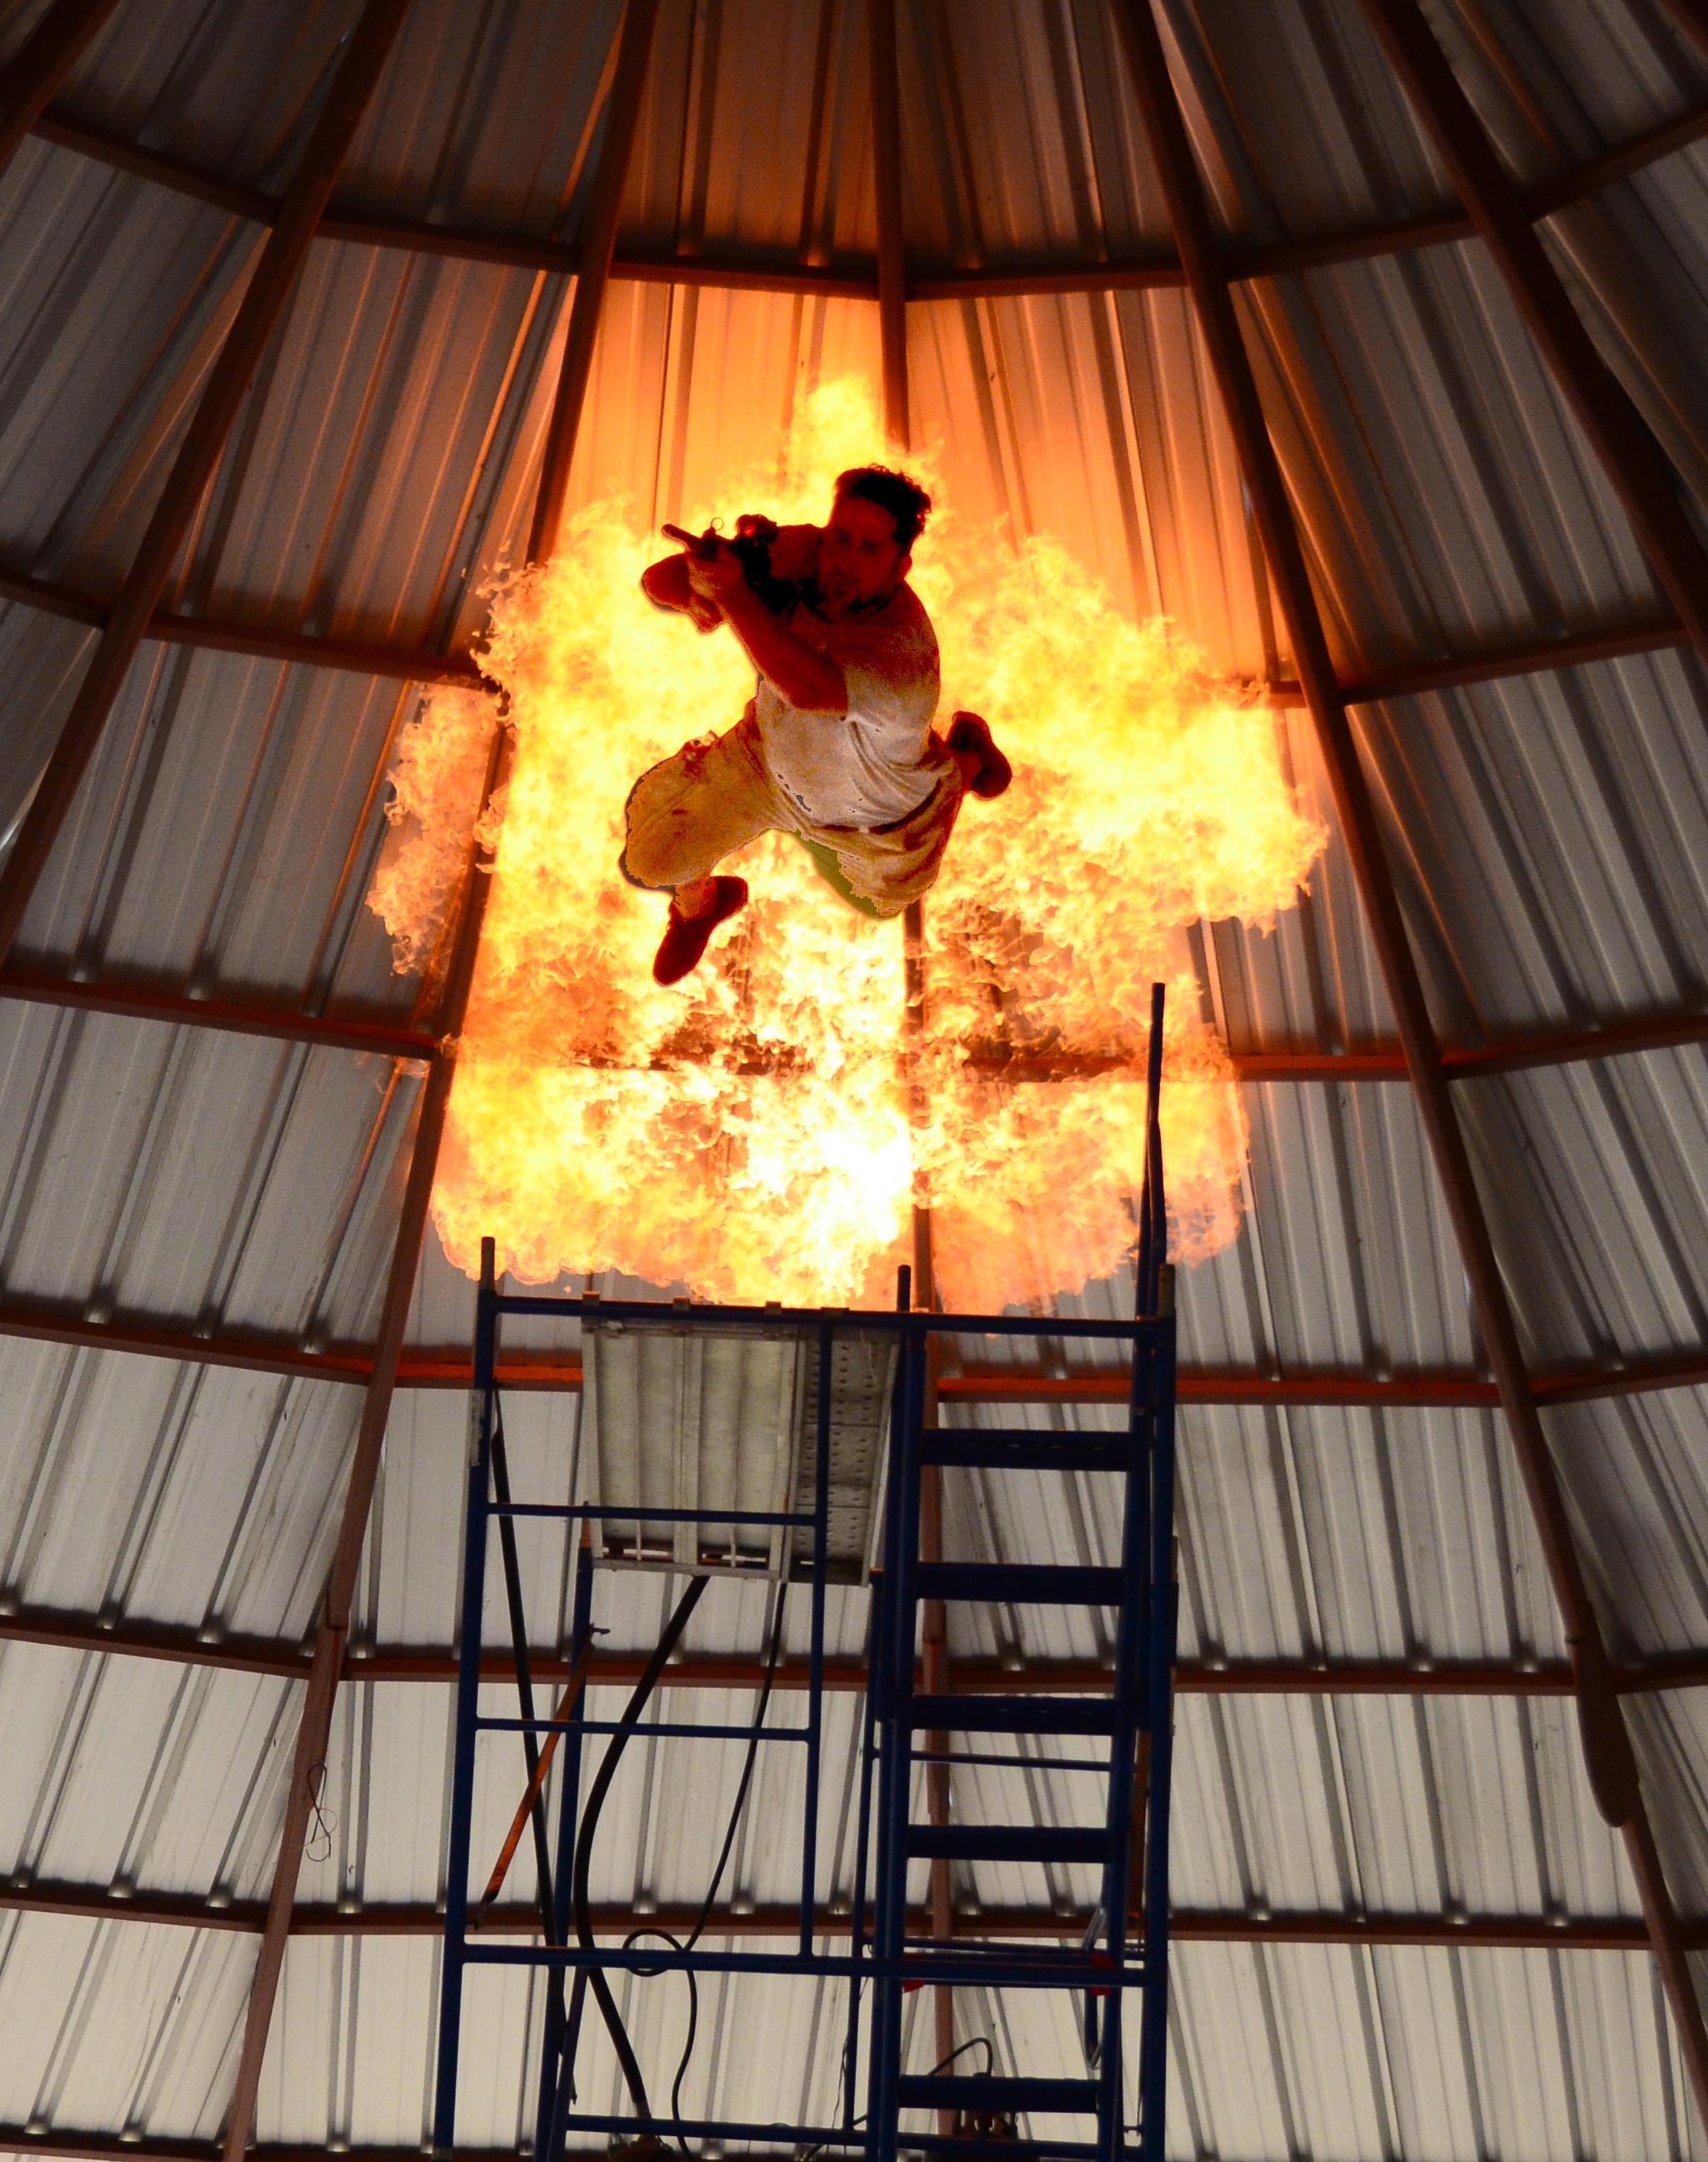 Blaze Free Fall